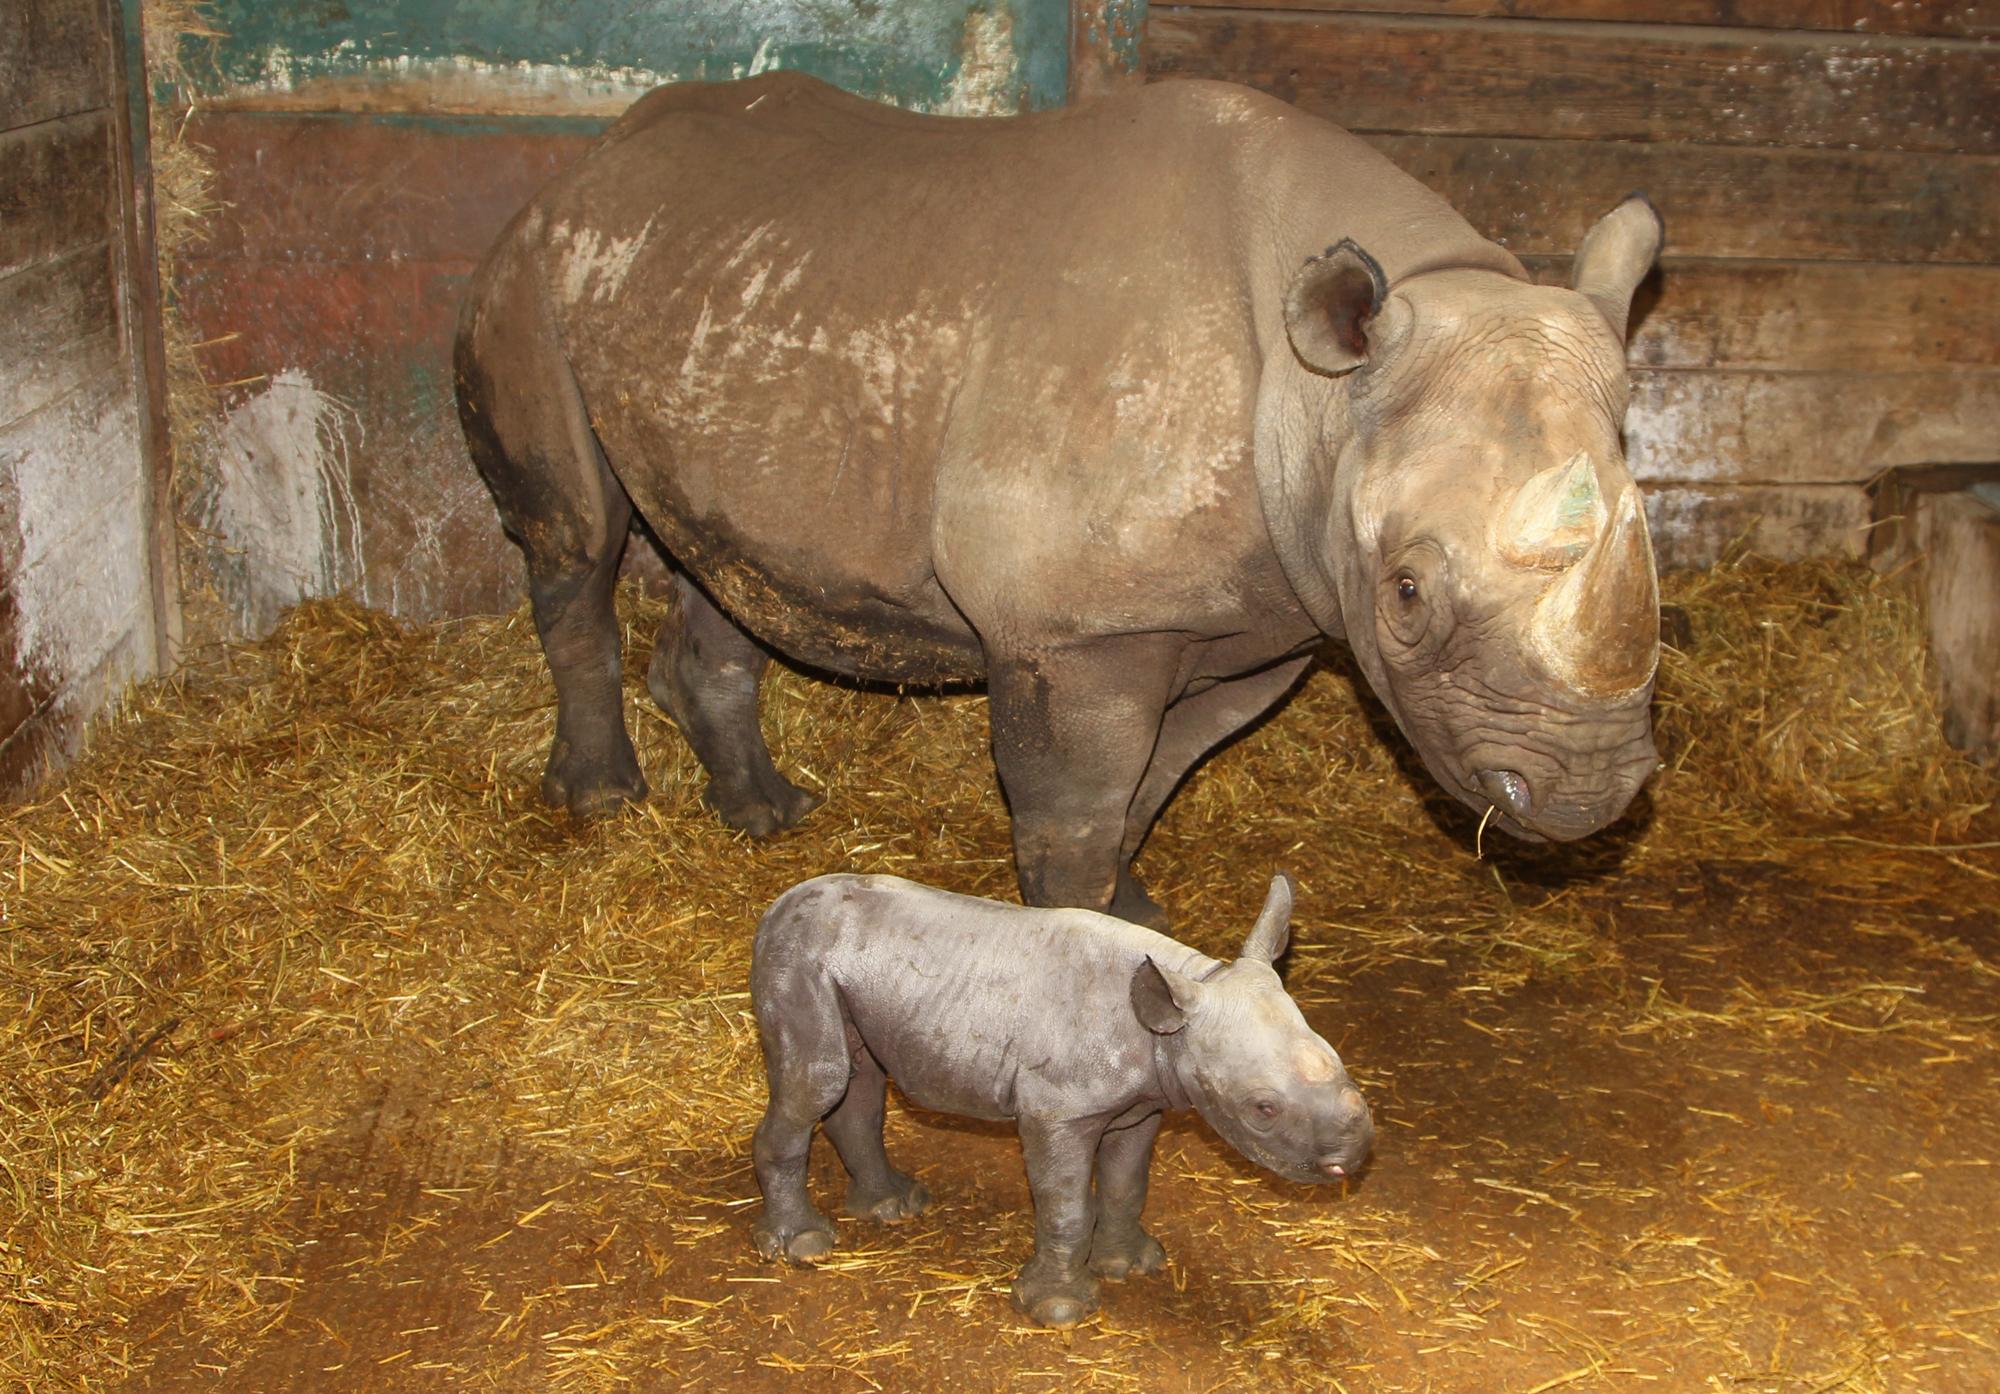 Newborn Baby Black Rhino at Port Lympne Wild Animal Park Brings Hope for Species